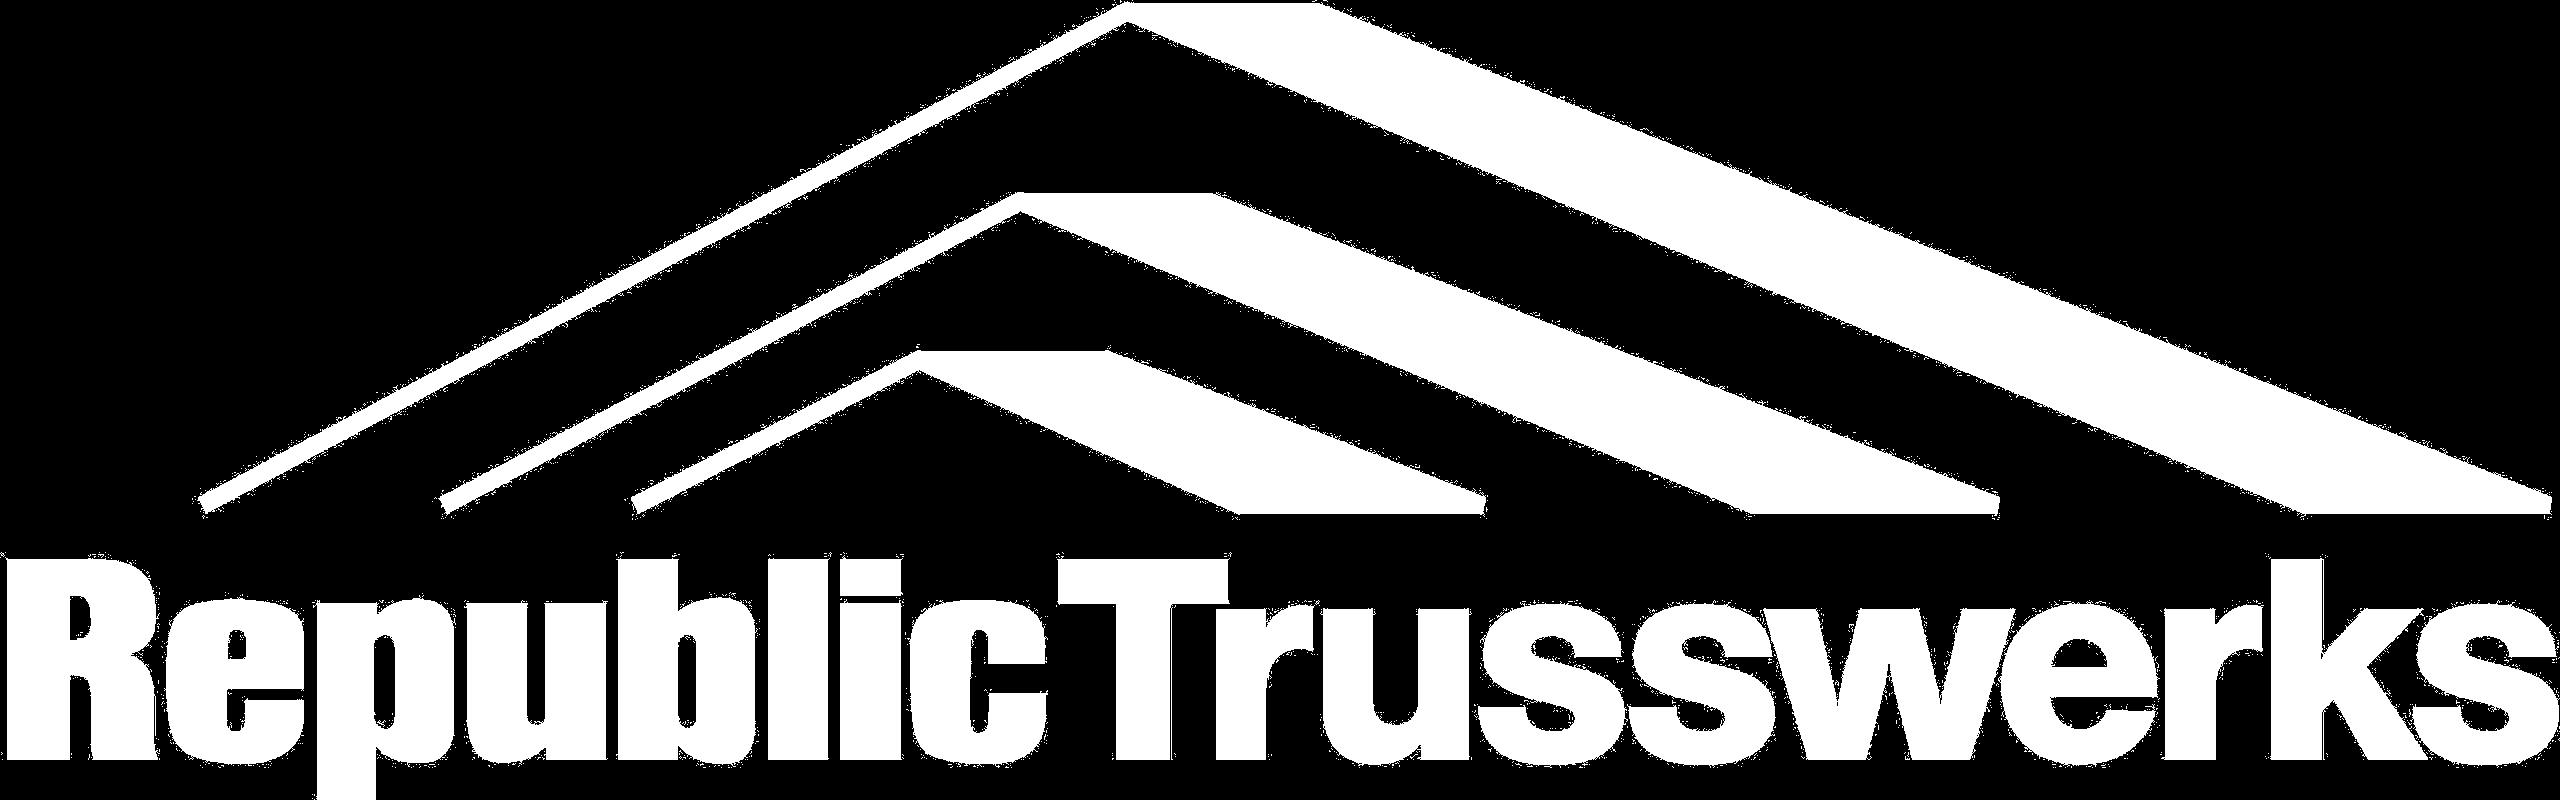 Current Career Opportunities   Republic Trusswerks